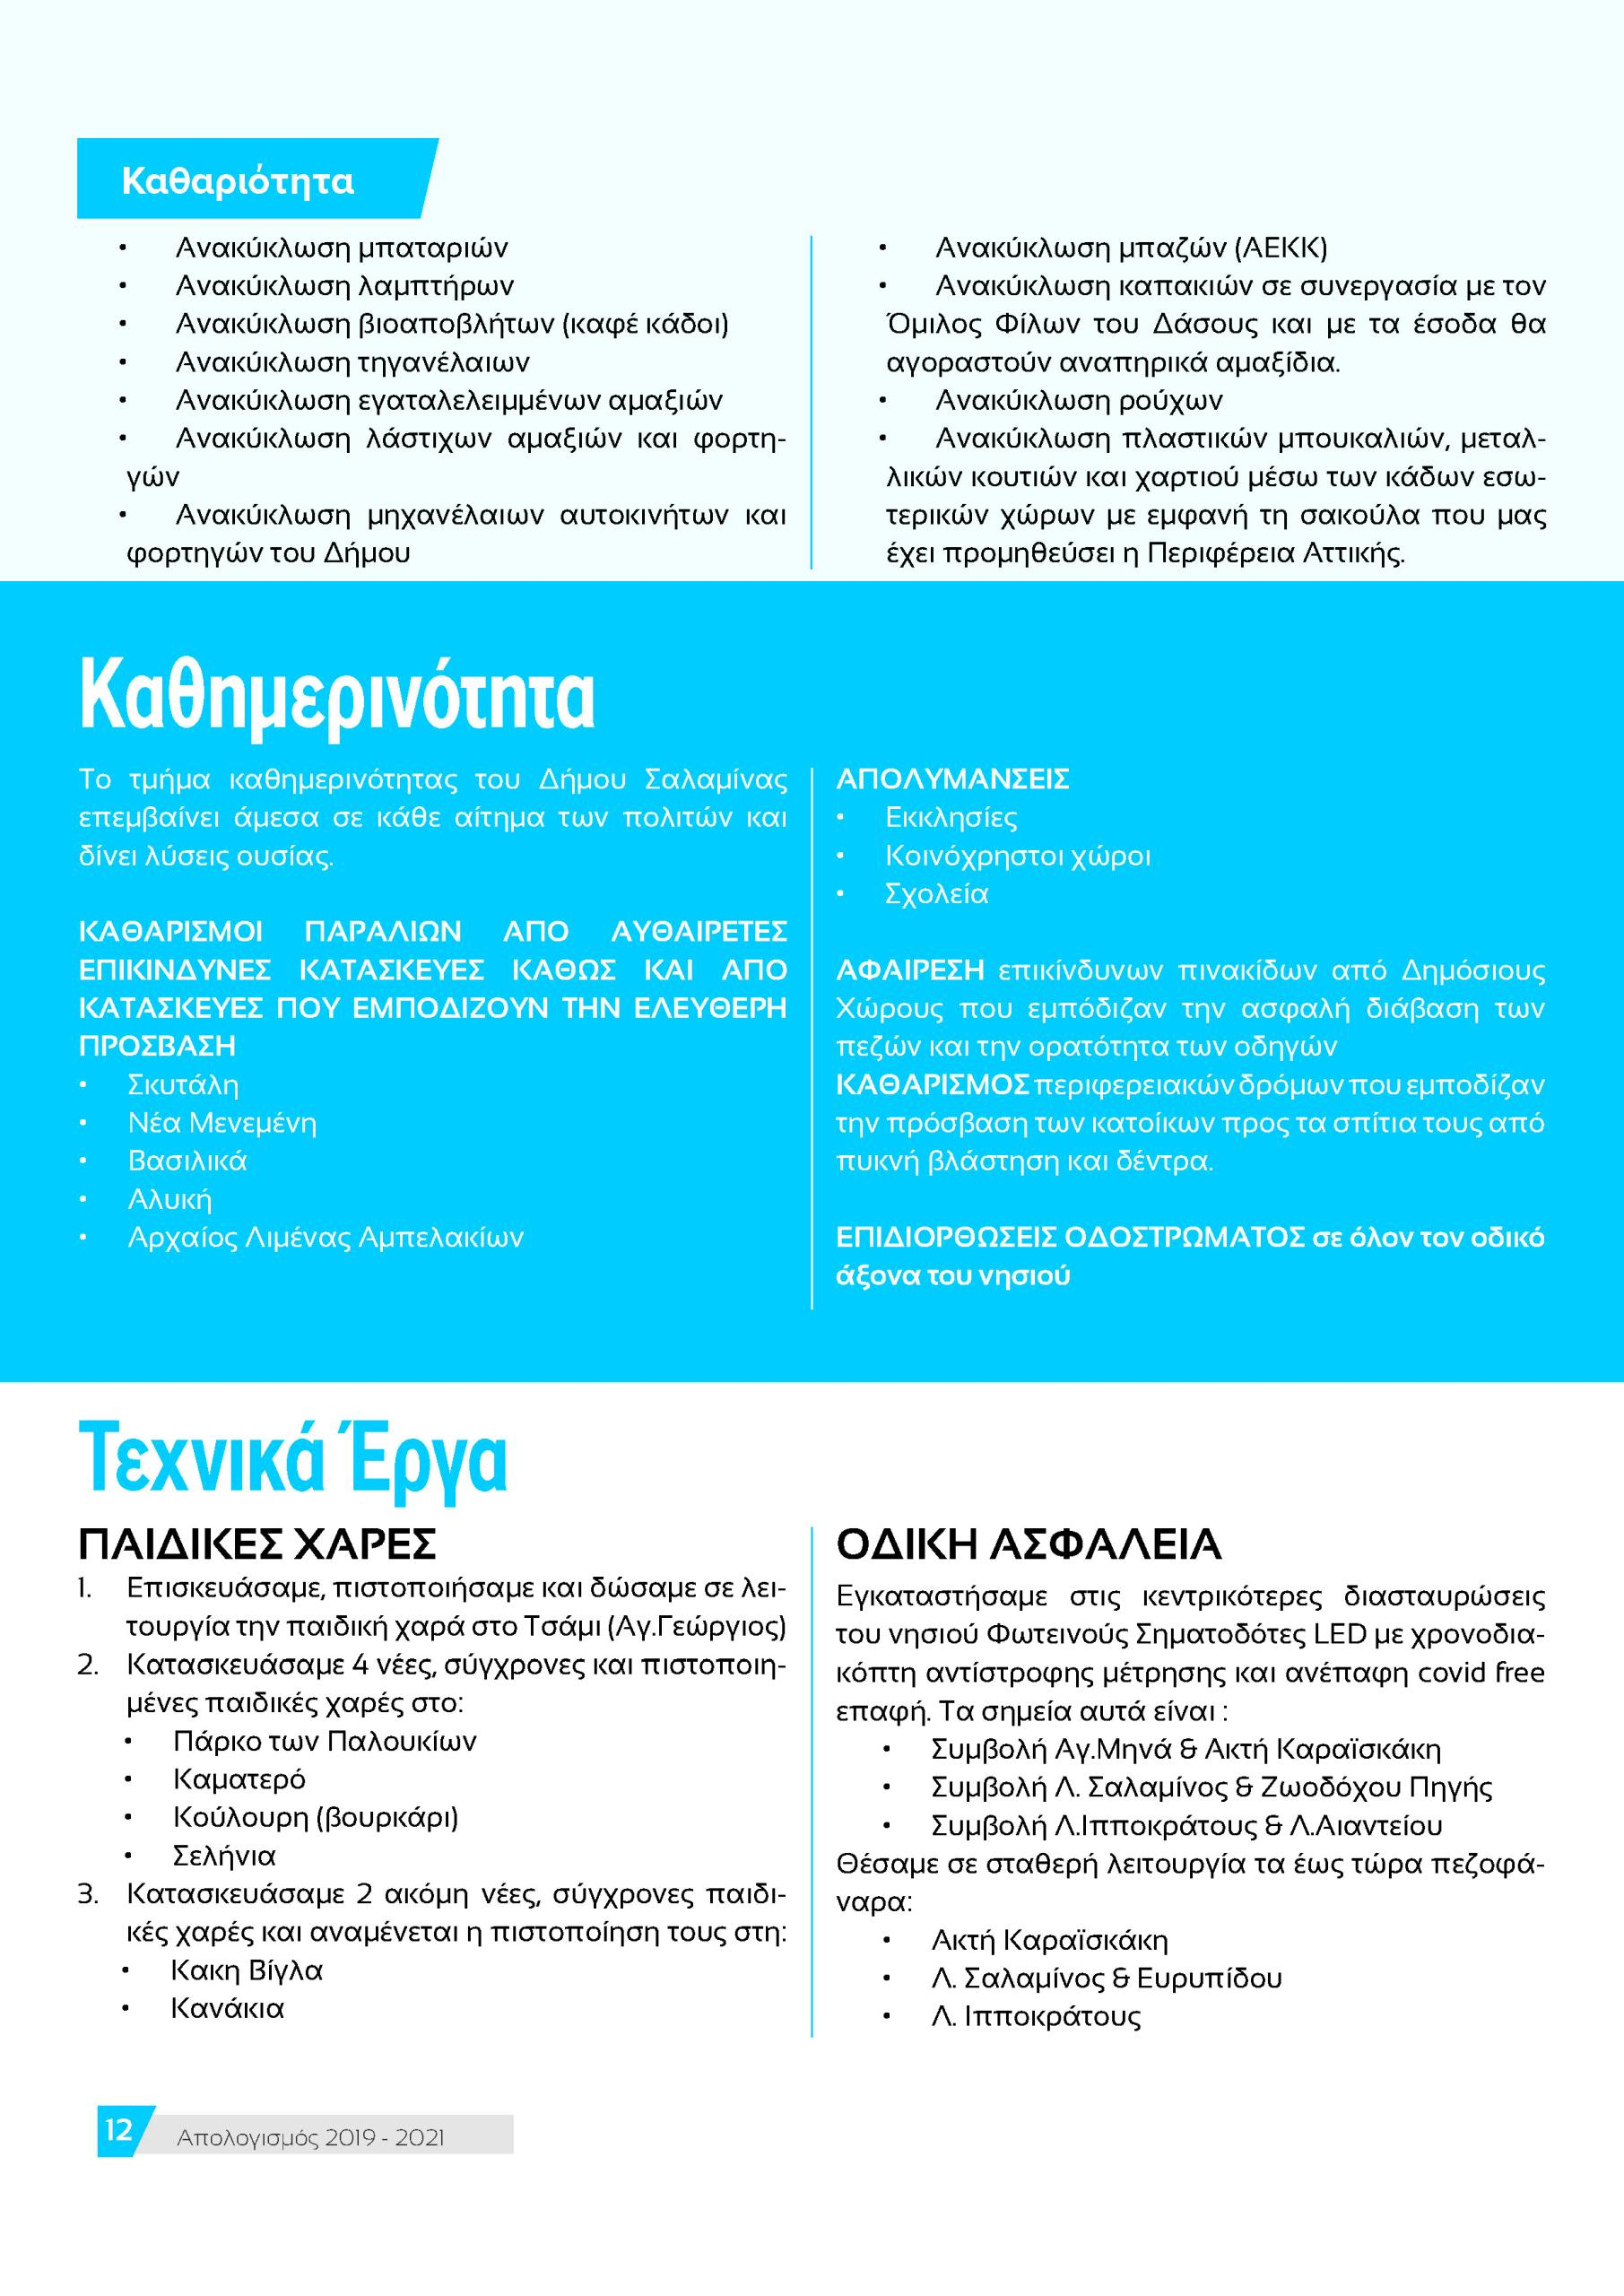 Brochure_Page_12